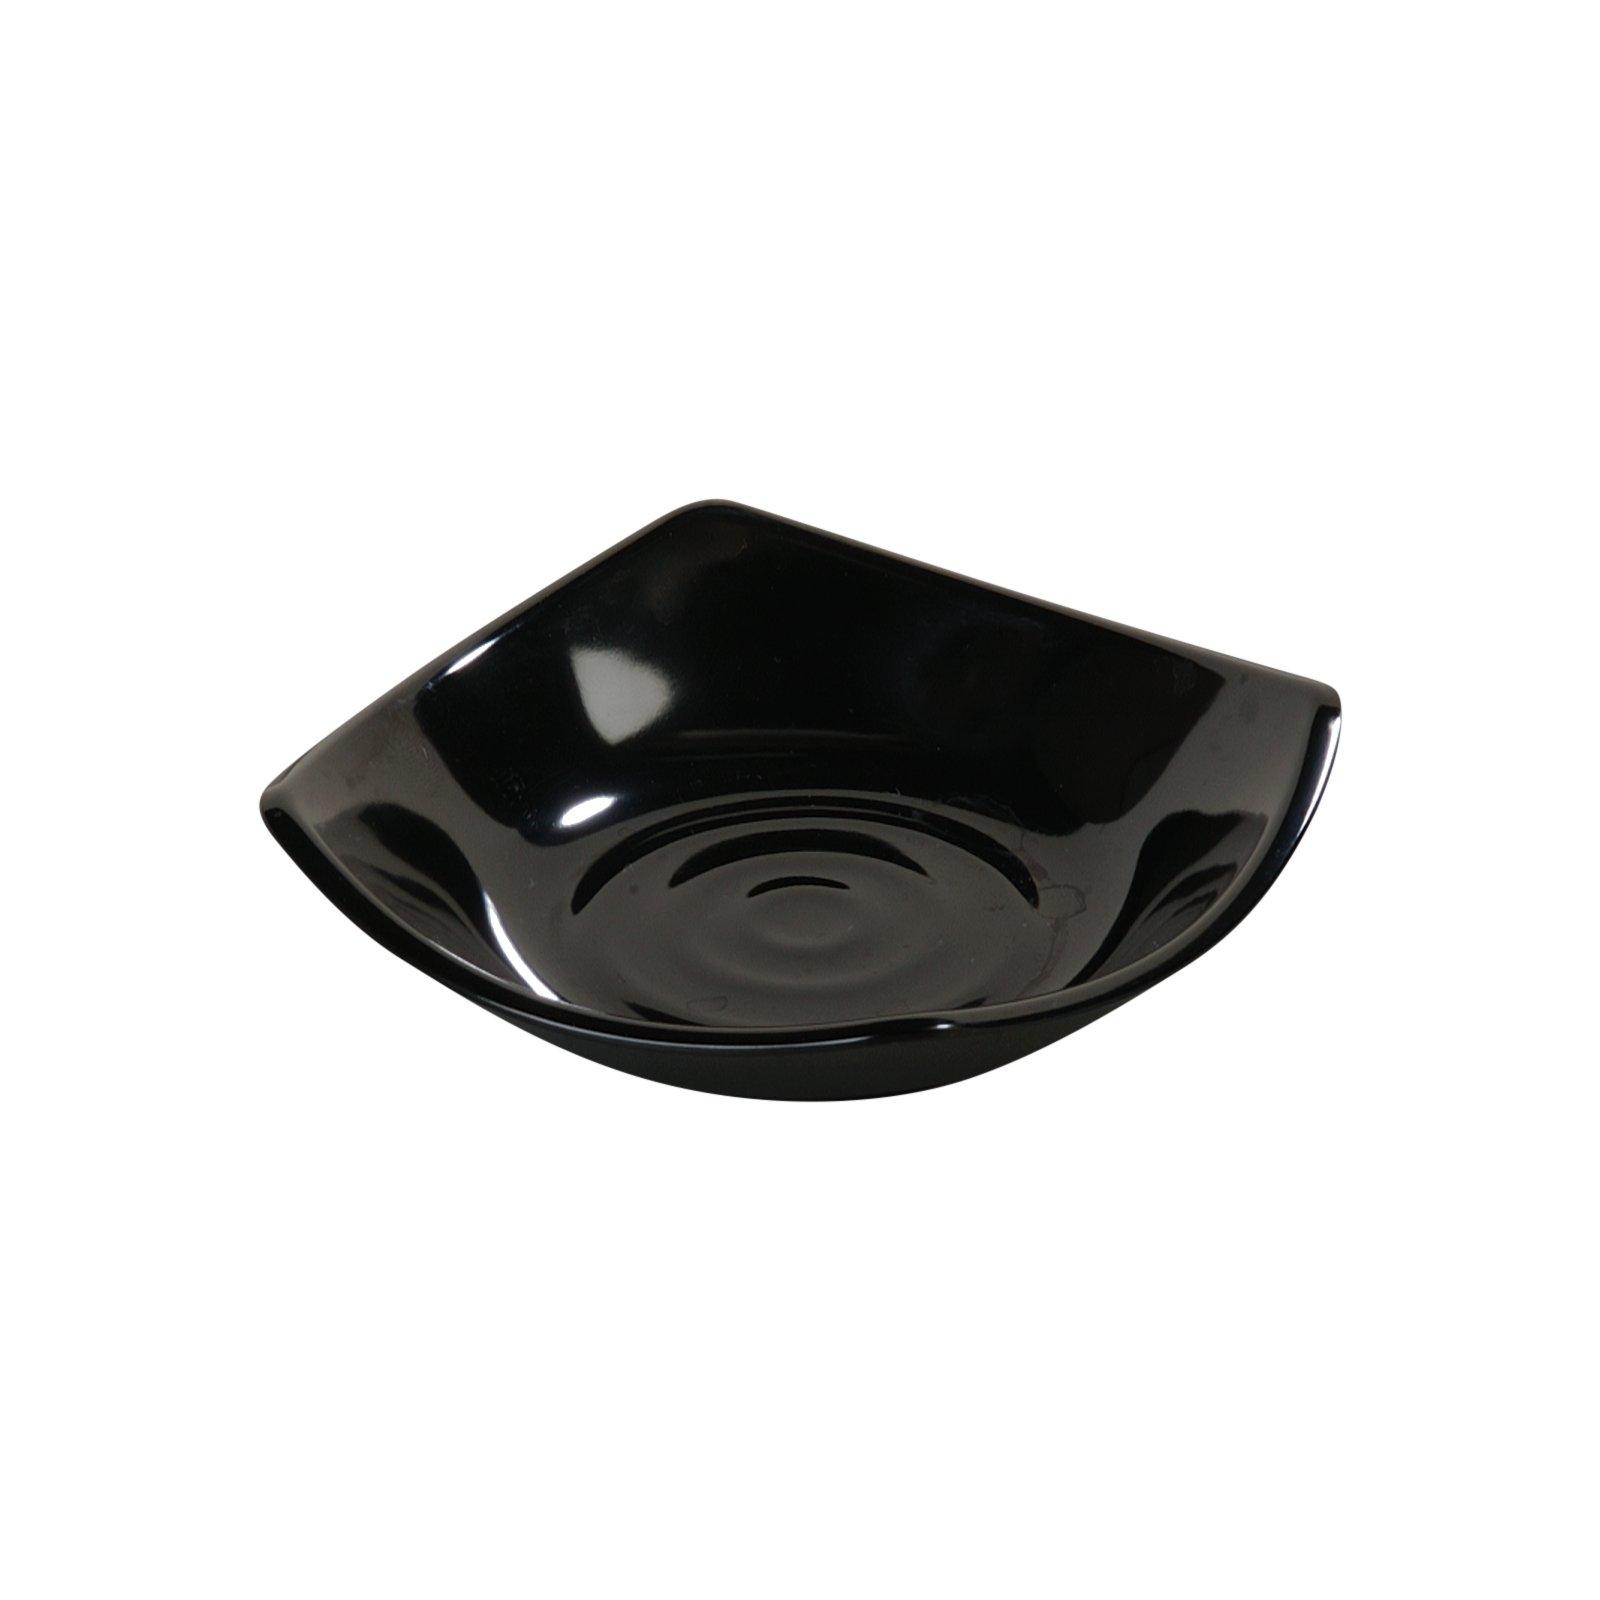 794203 - Melamine Flared Rim Square Dish Bowl 5.25\